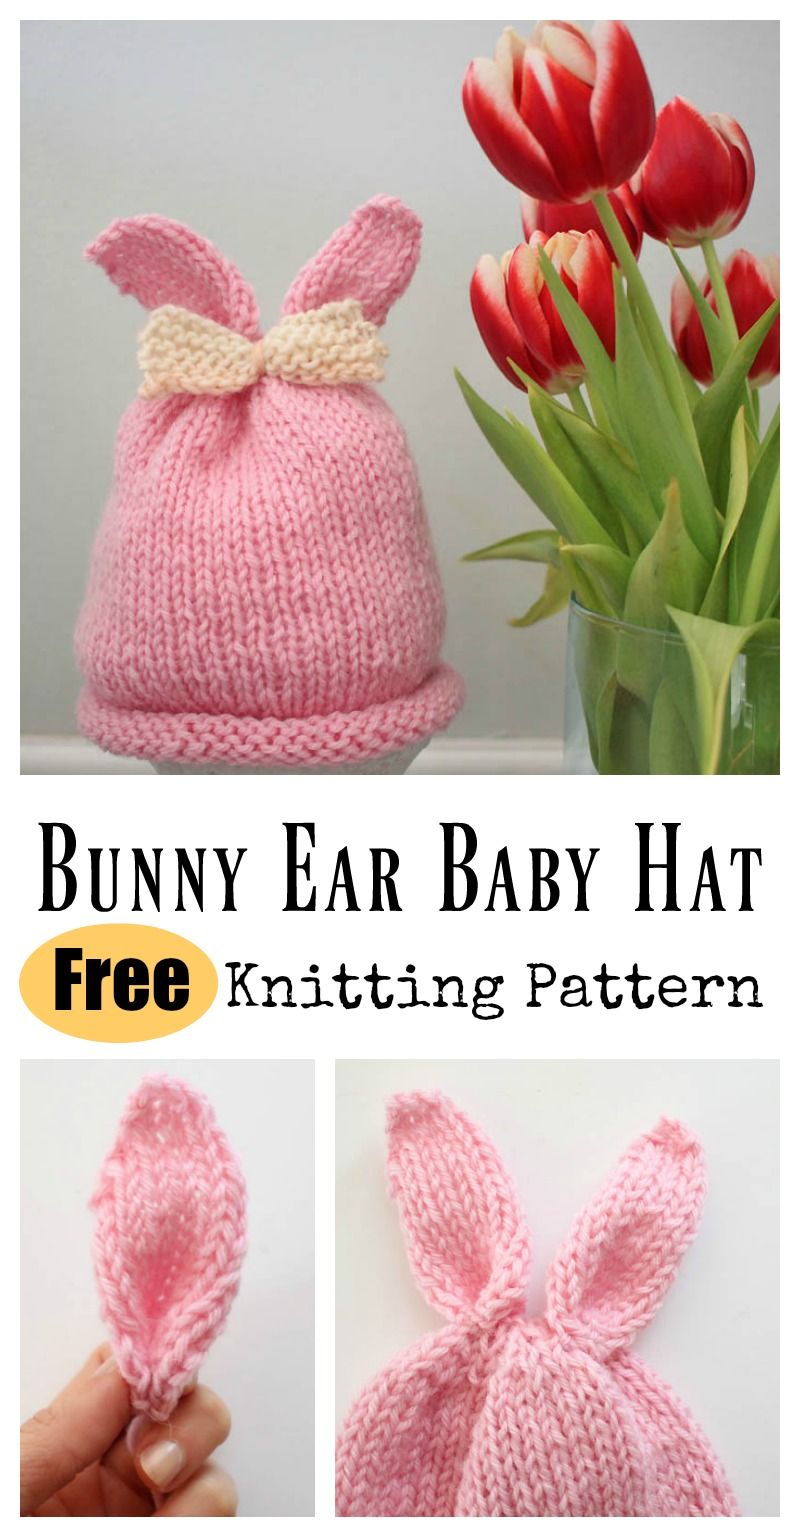 Bunny Ear Baby Hat Free Knitting Pattern Baby Hat Knitting Patterns Free Baby Hat Knitting Pattern Baby Hat Free Pattern